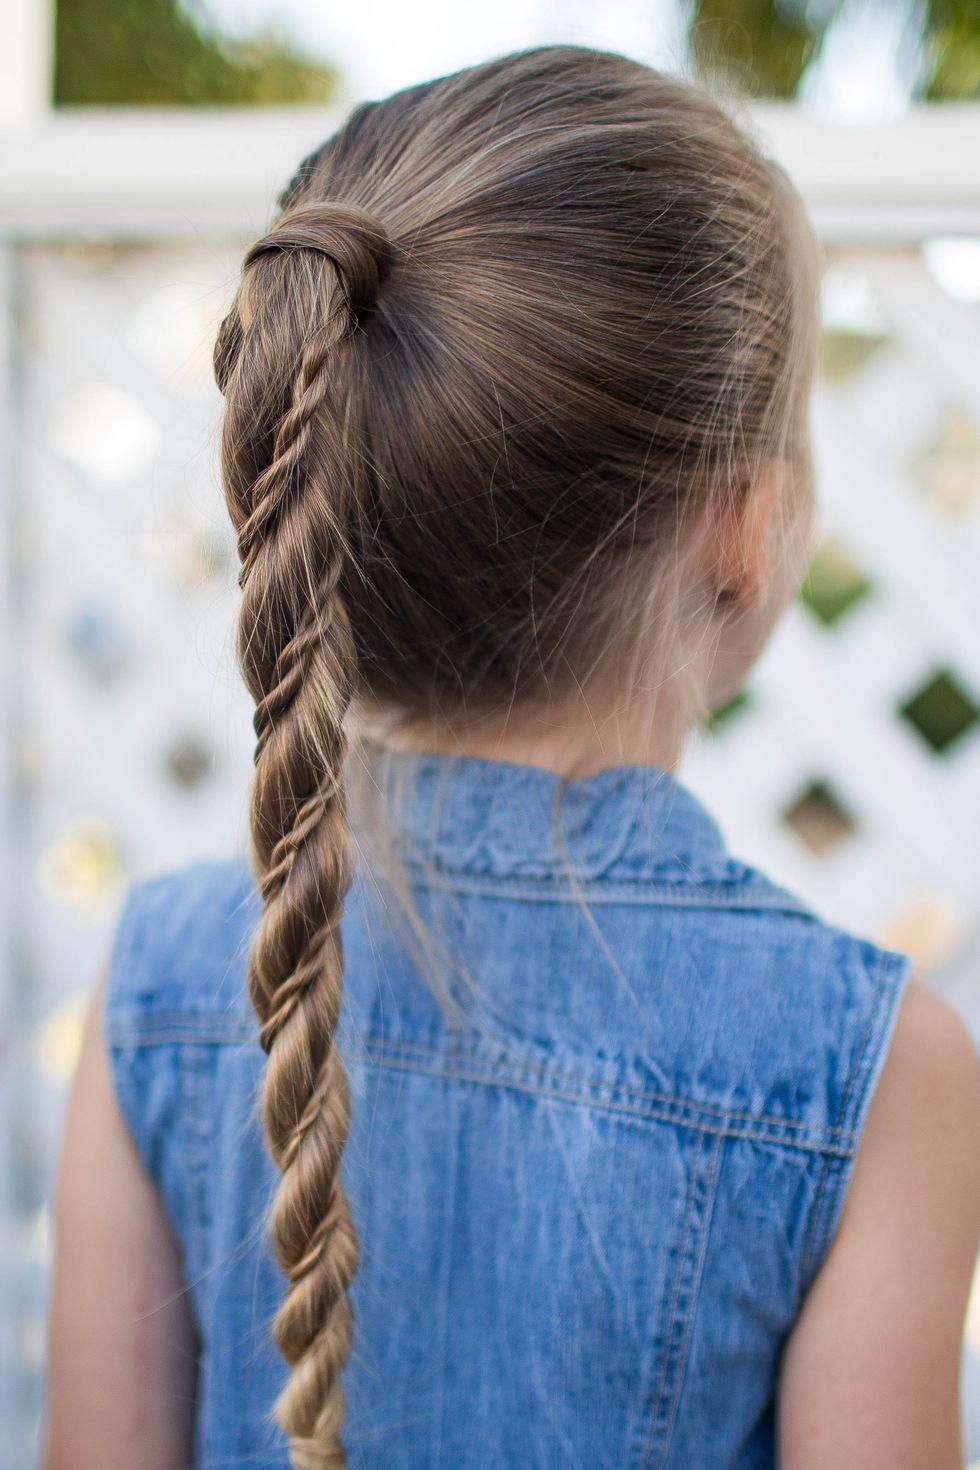 Twist-Wrap-Ponytail 10 super cute braid hairstyles for kids